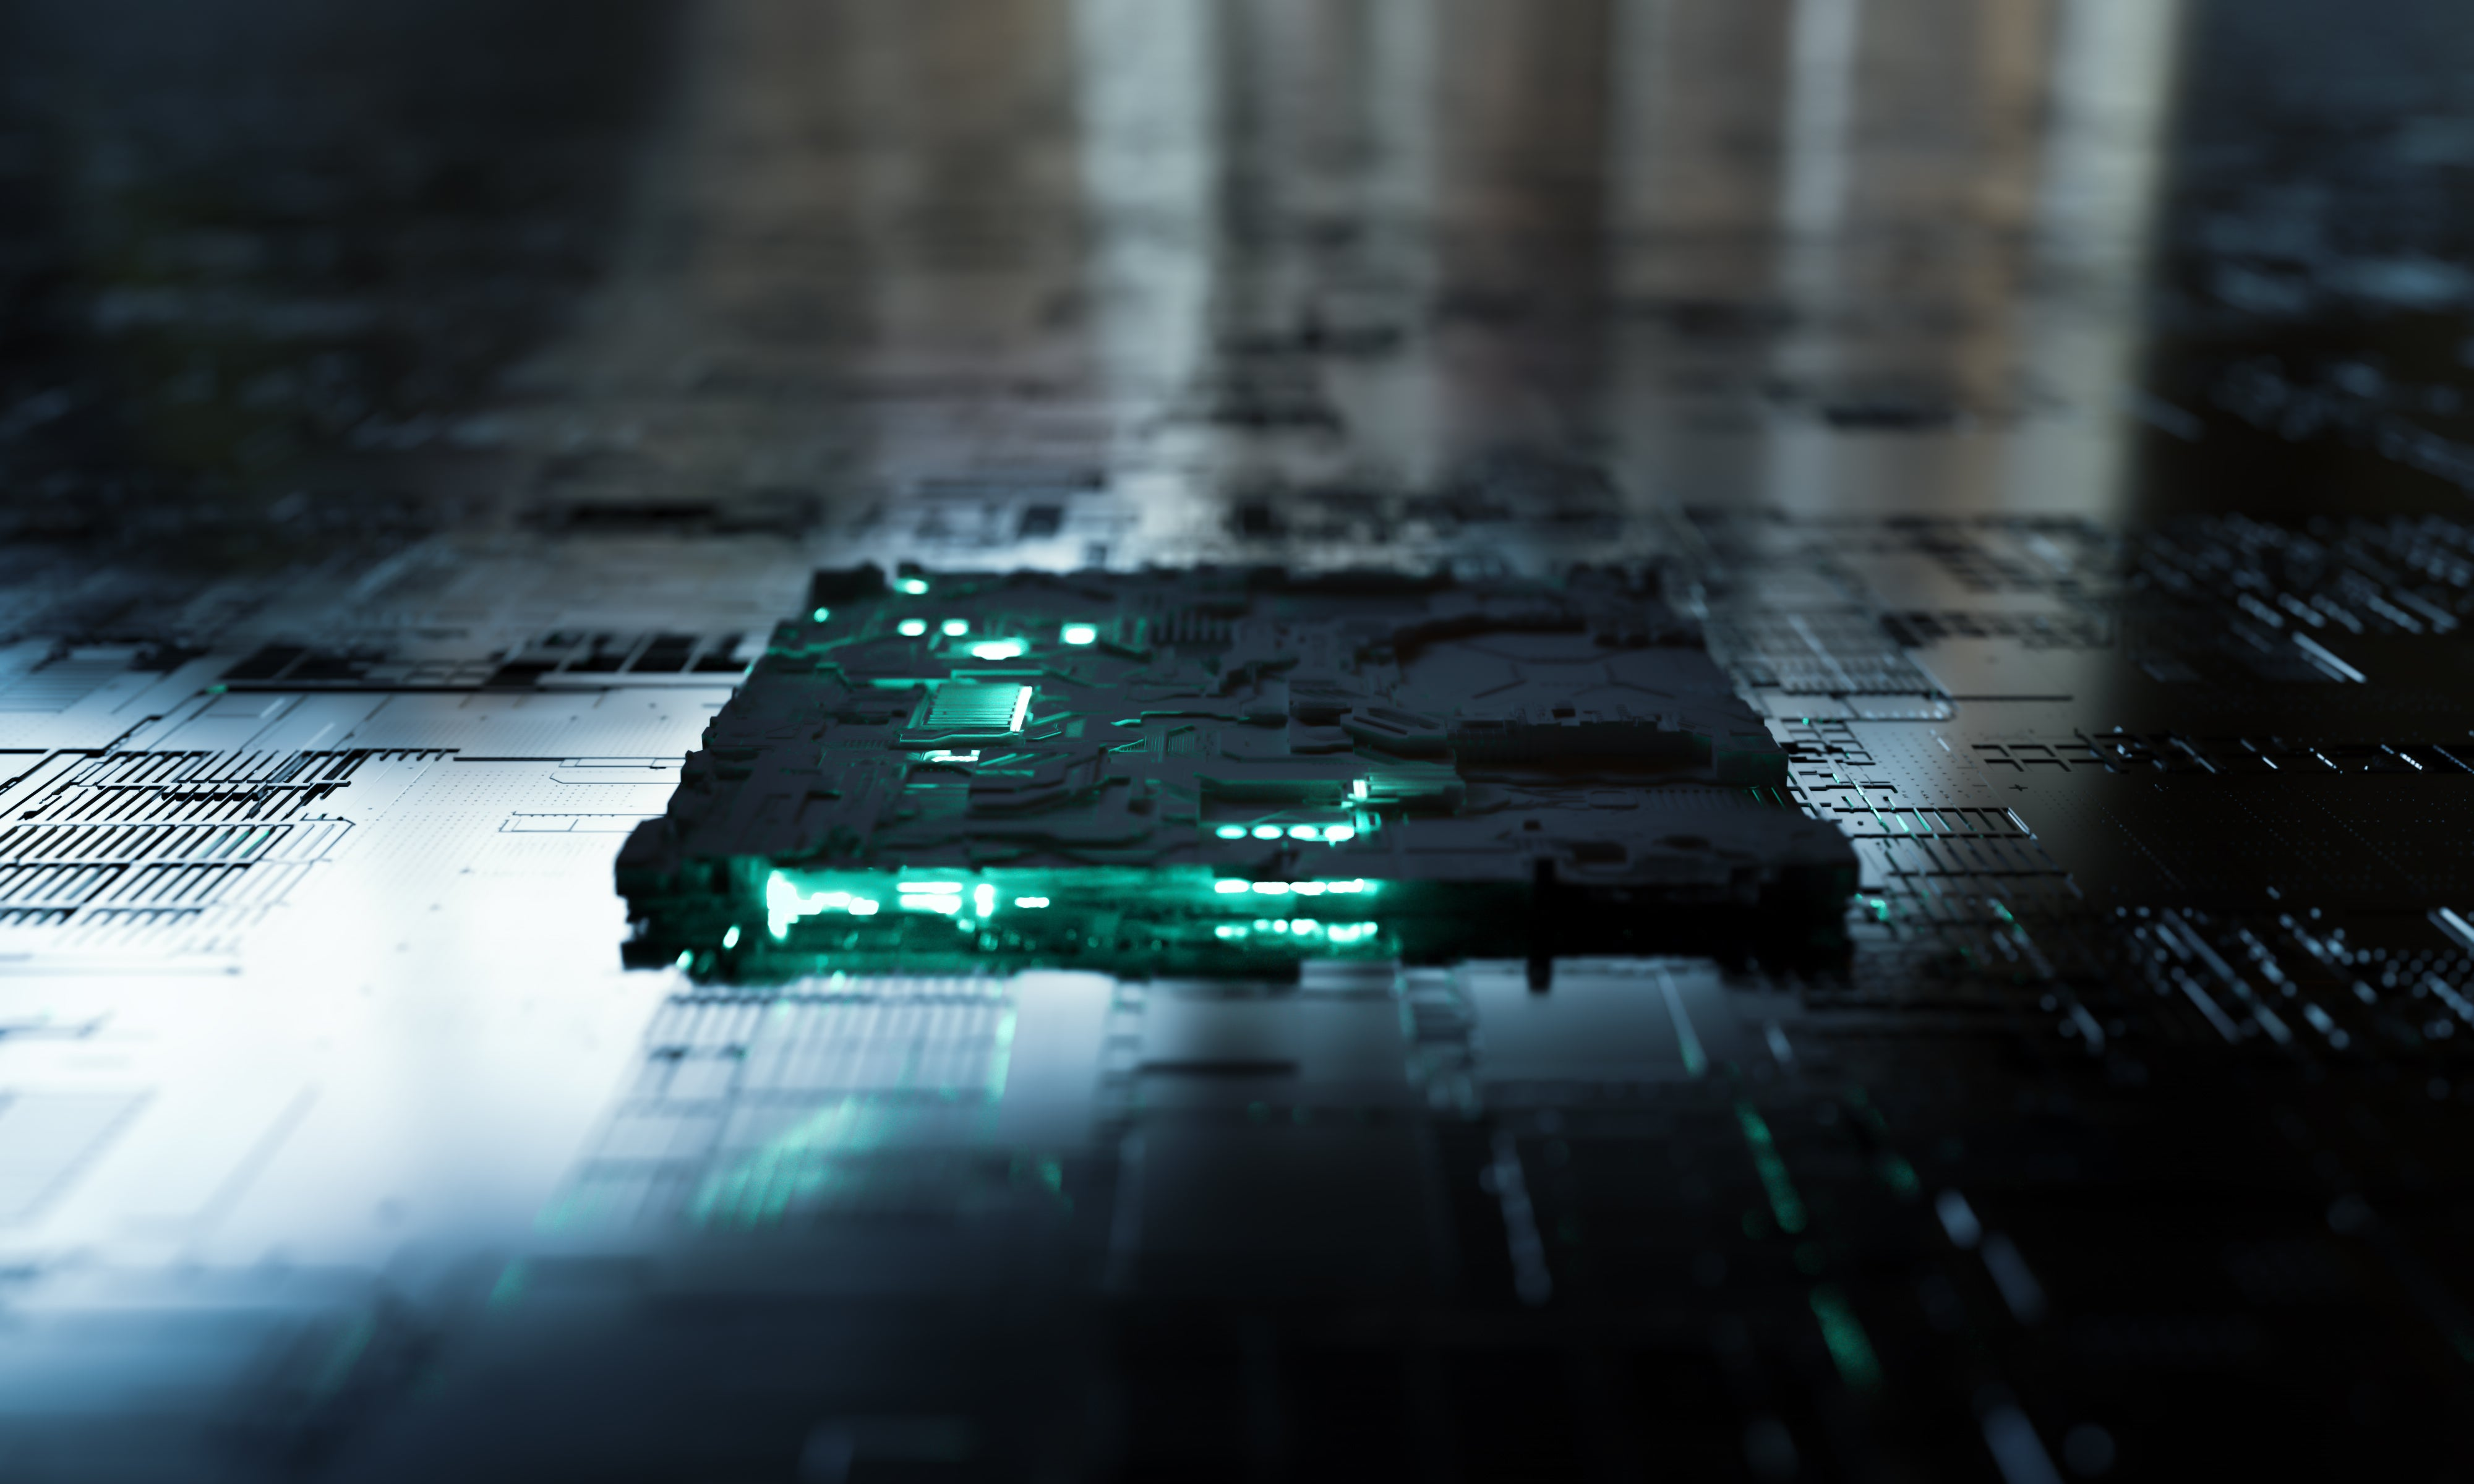 Better Semiconductor Stock: ASML vs. TSMC